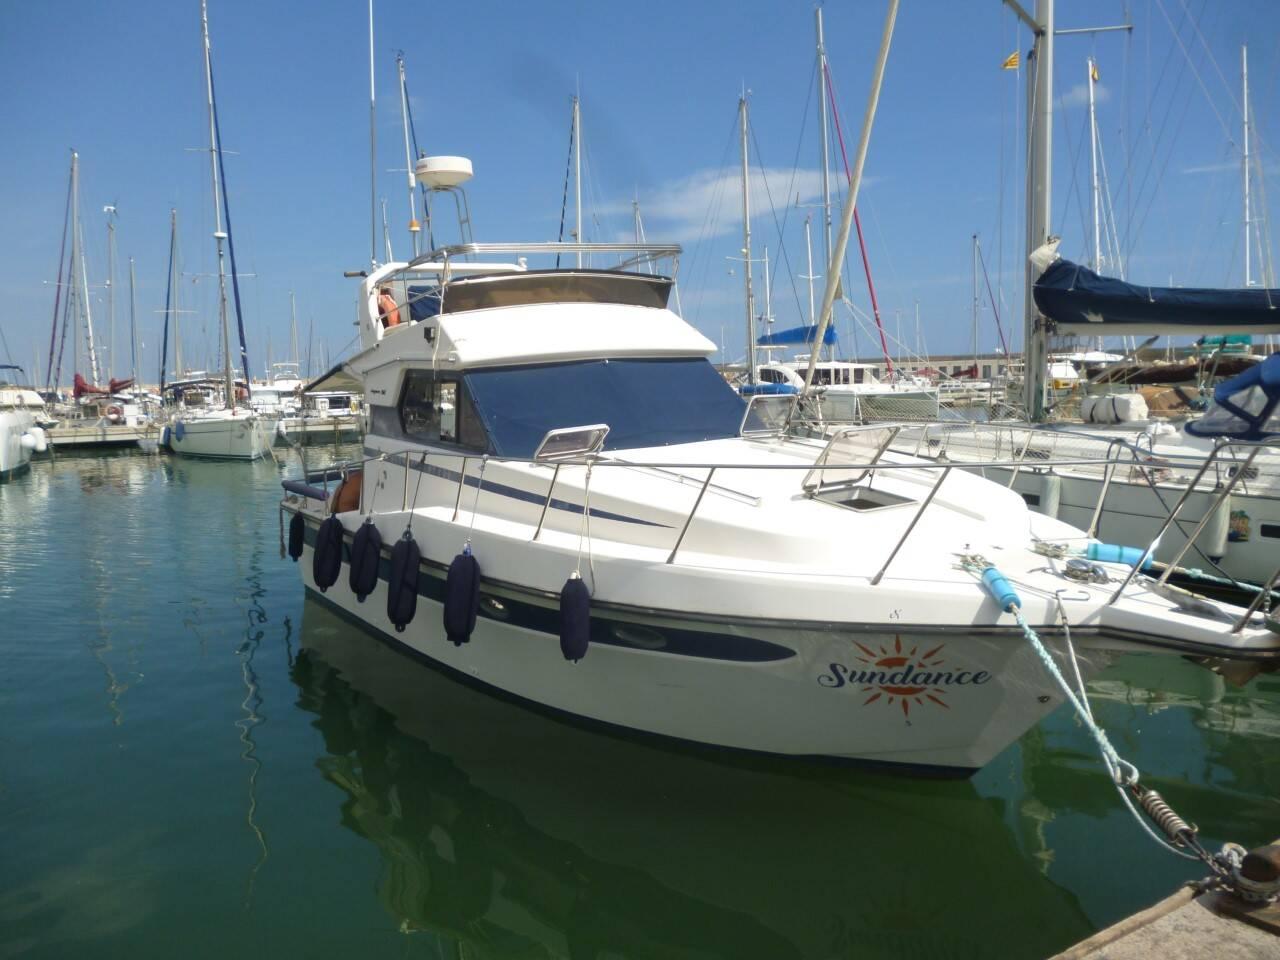 Doqueve 360 Motor Boat for sale in Barcelona lovely boat